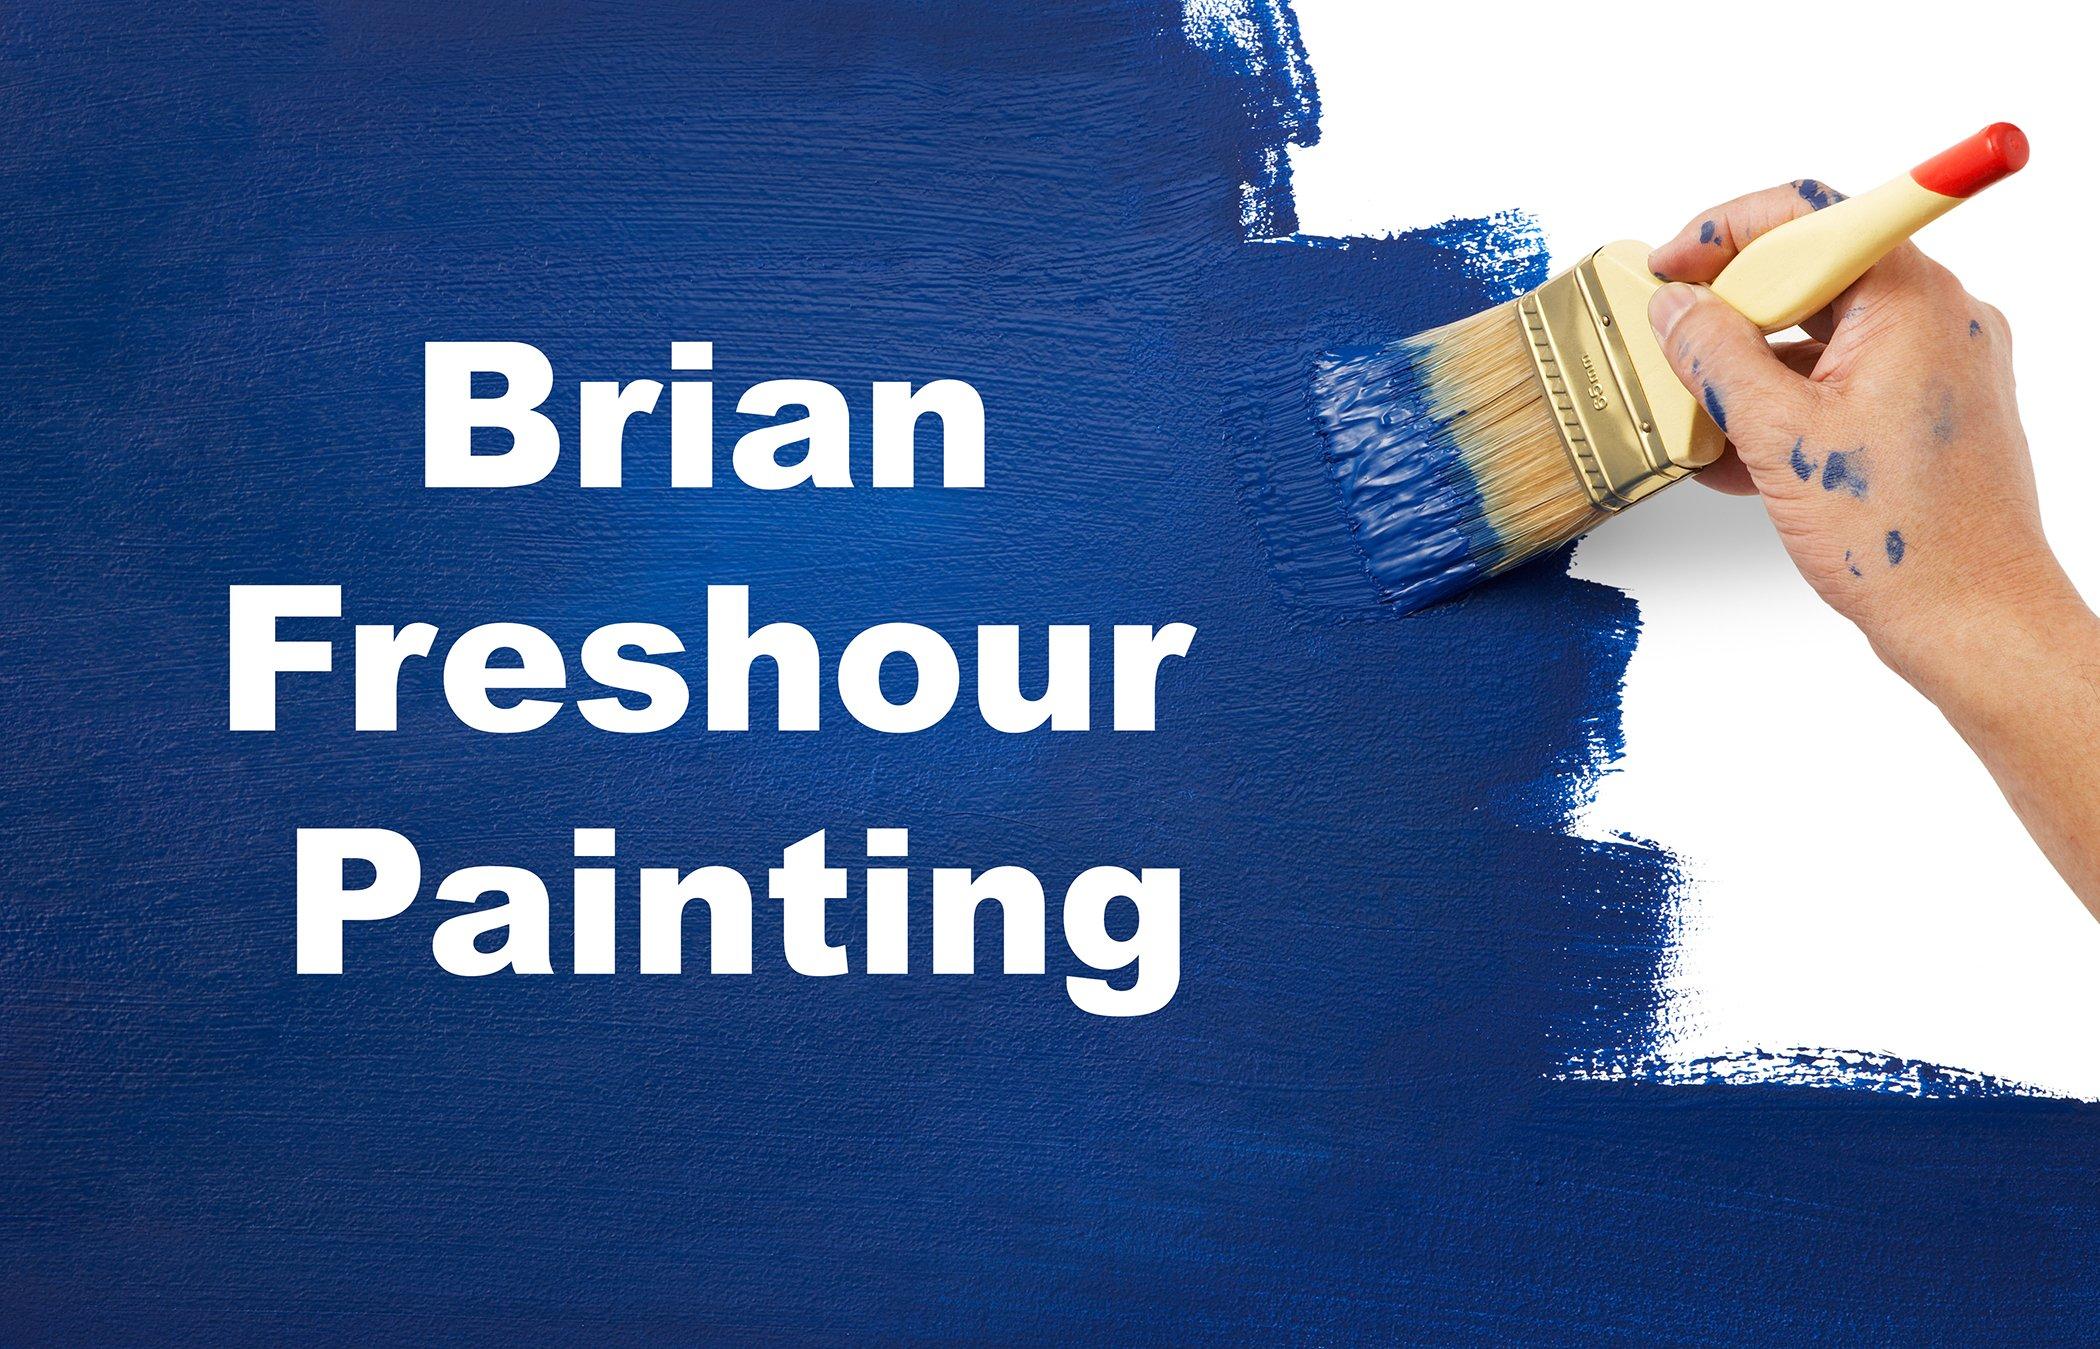 Brian Freshour Painting